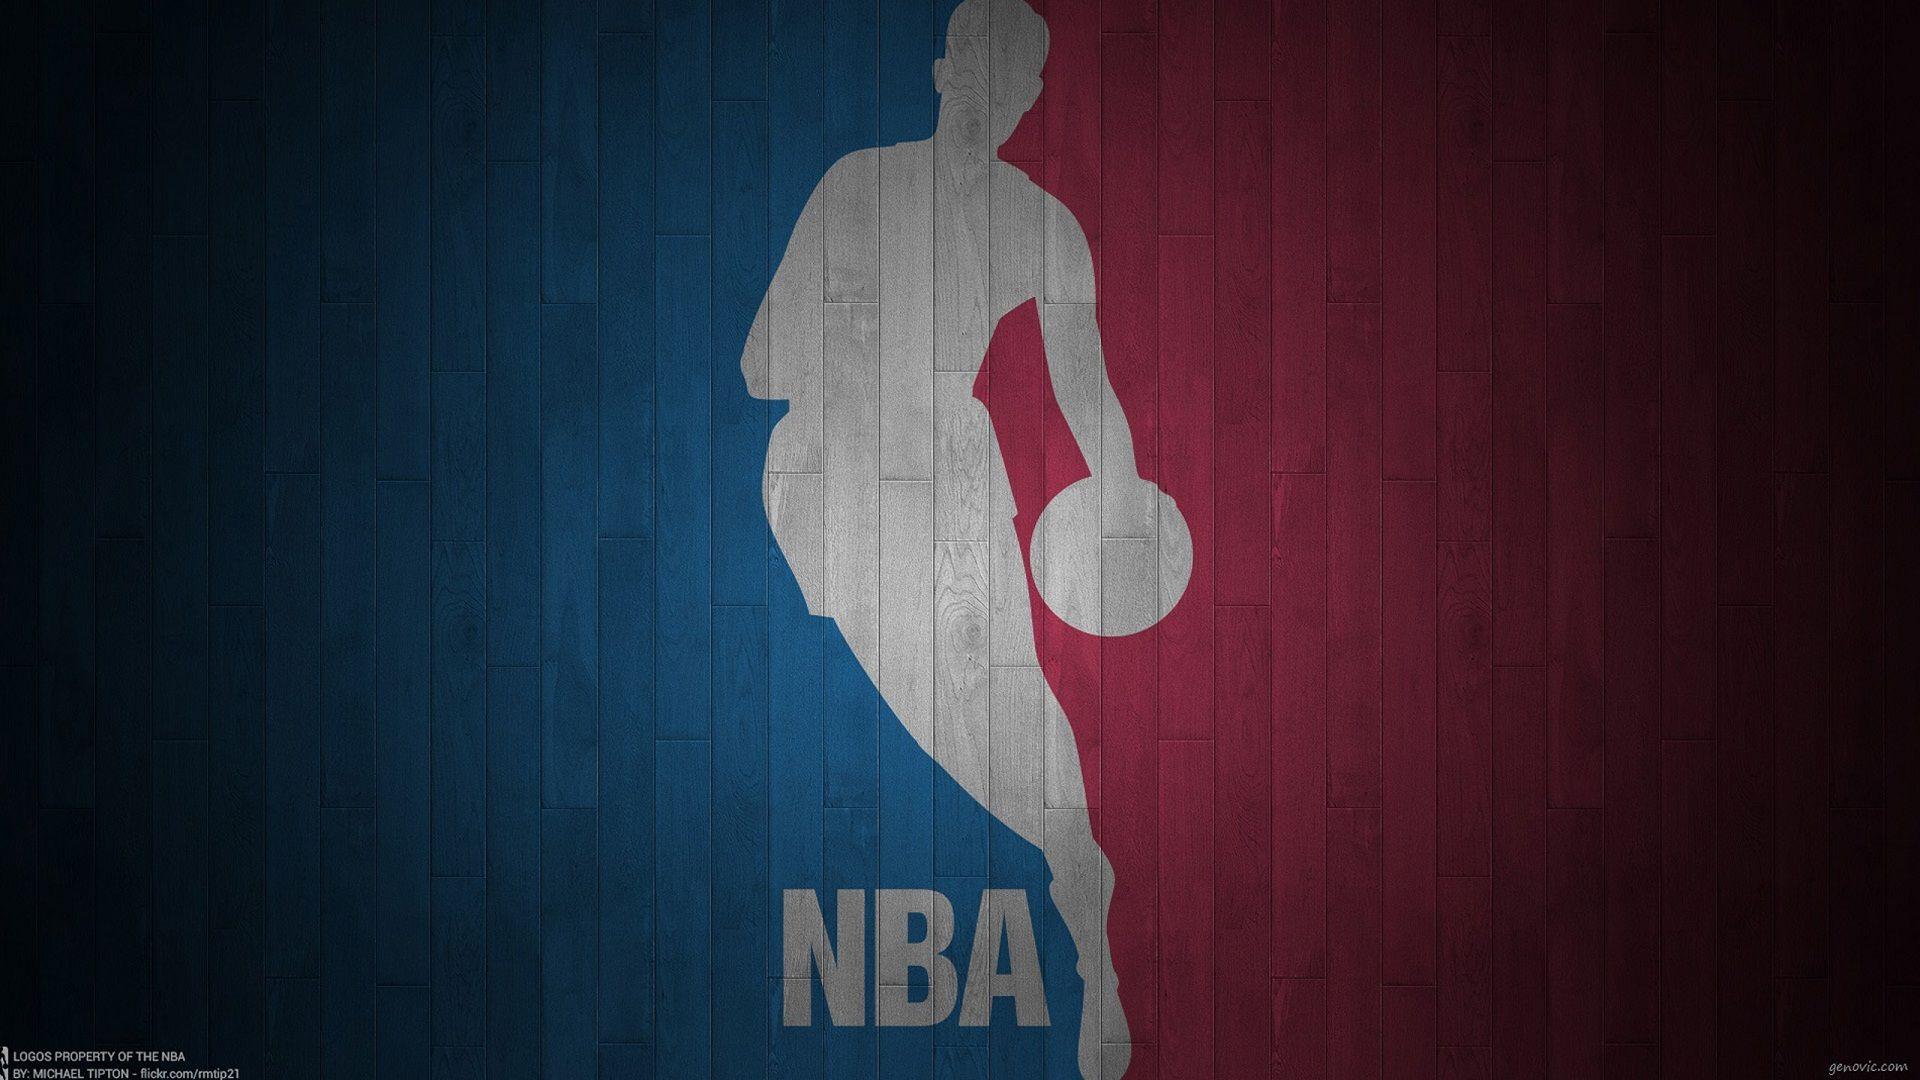 Nba Logo Wallpaper Hd 2015 Nba Logo Nba Wallpapers Nba